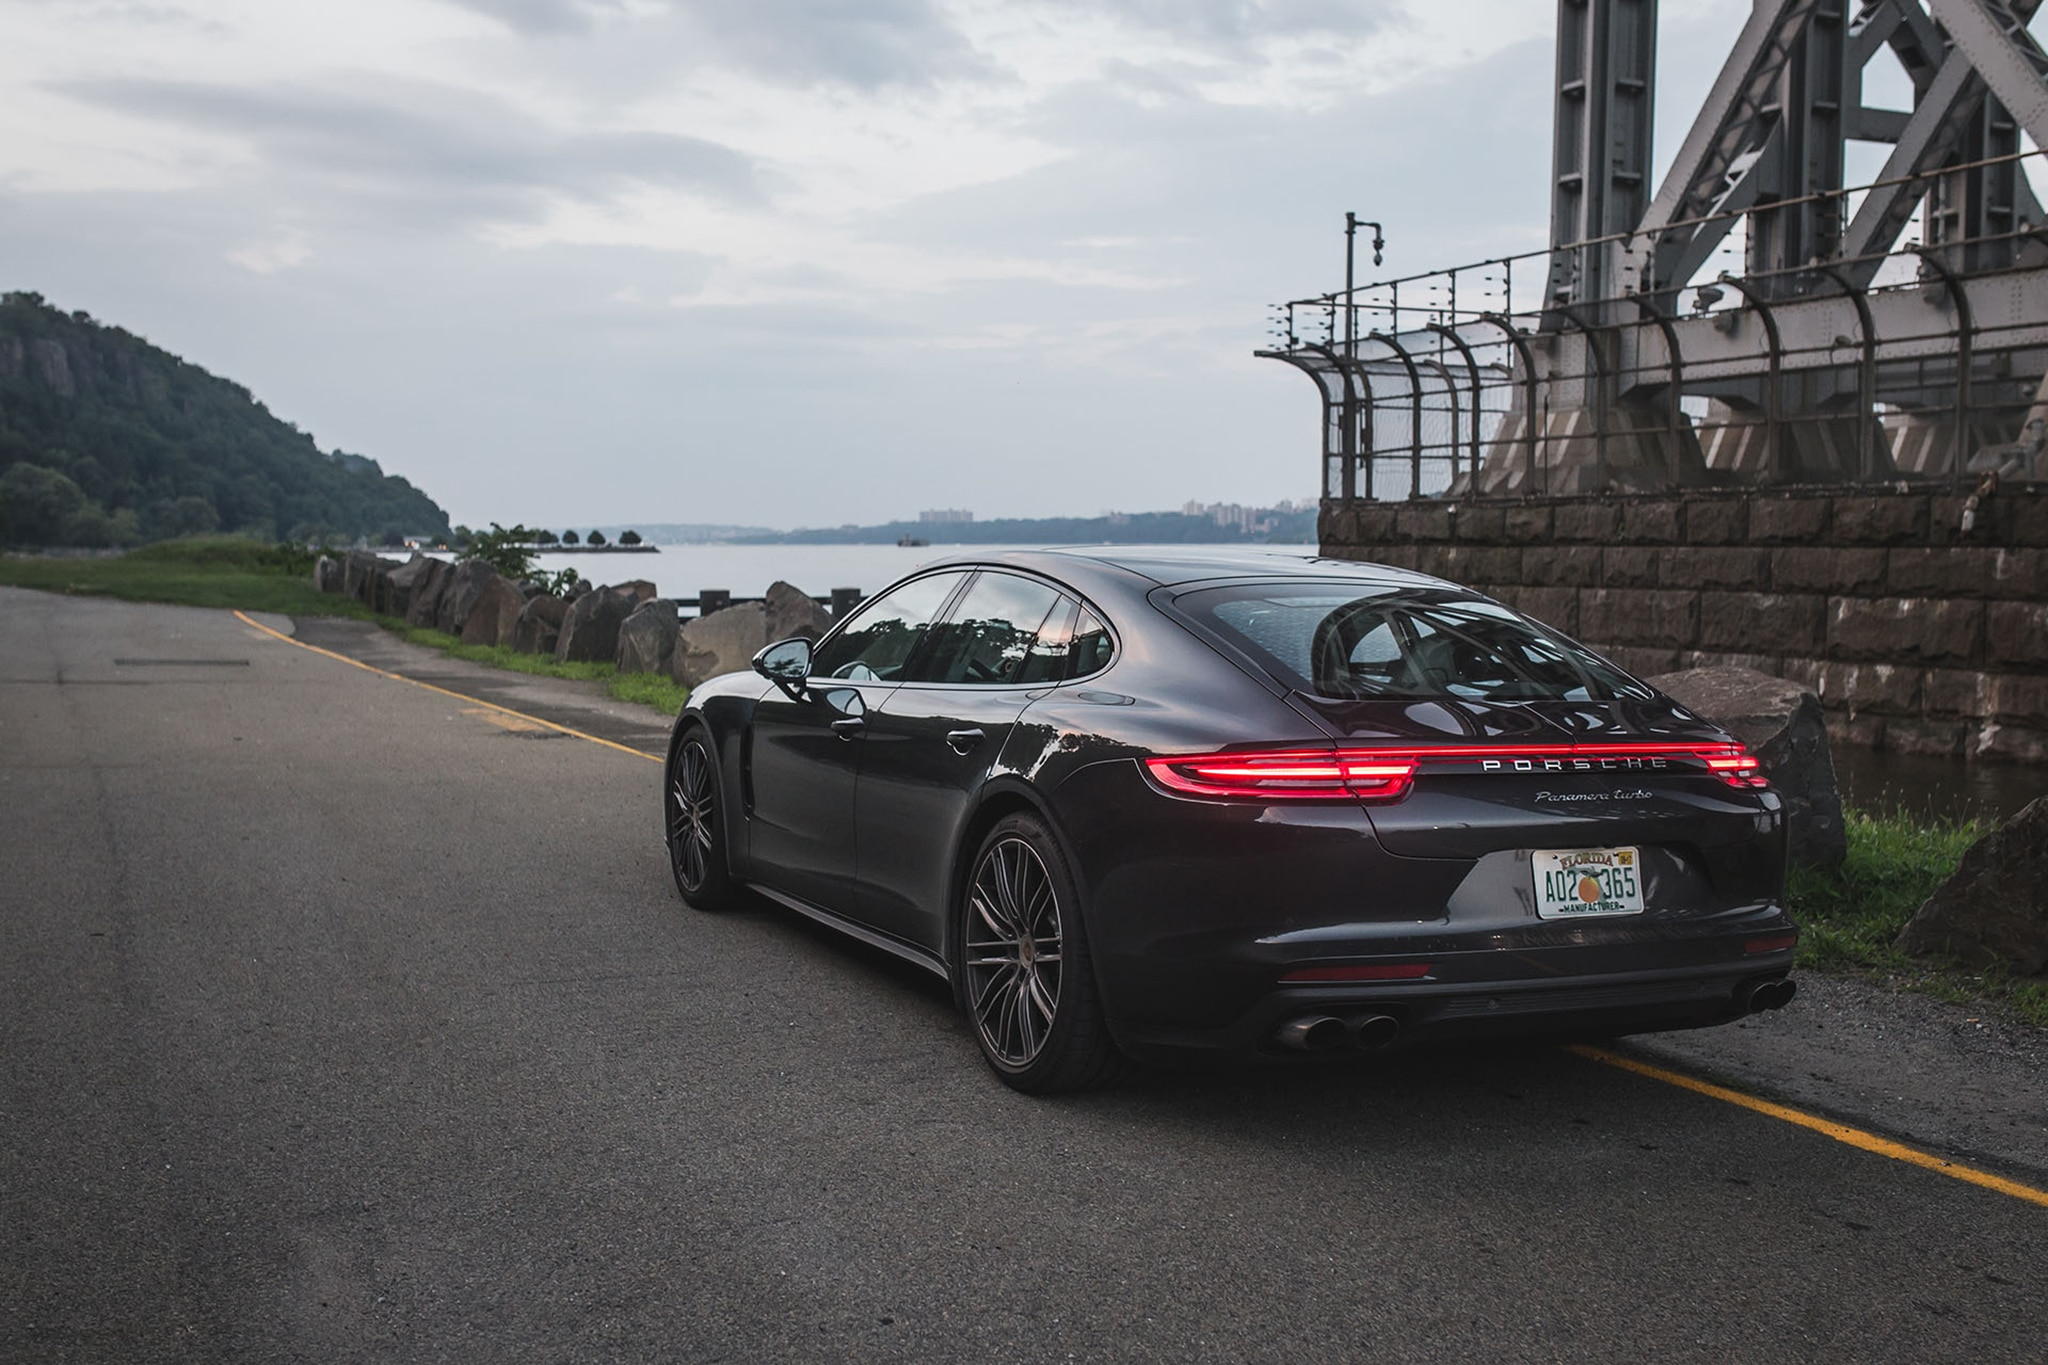 2017 Porsche Panamera Turbo One Week Review Automobile Magazine